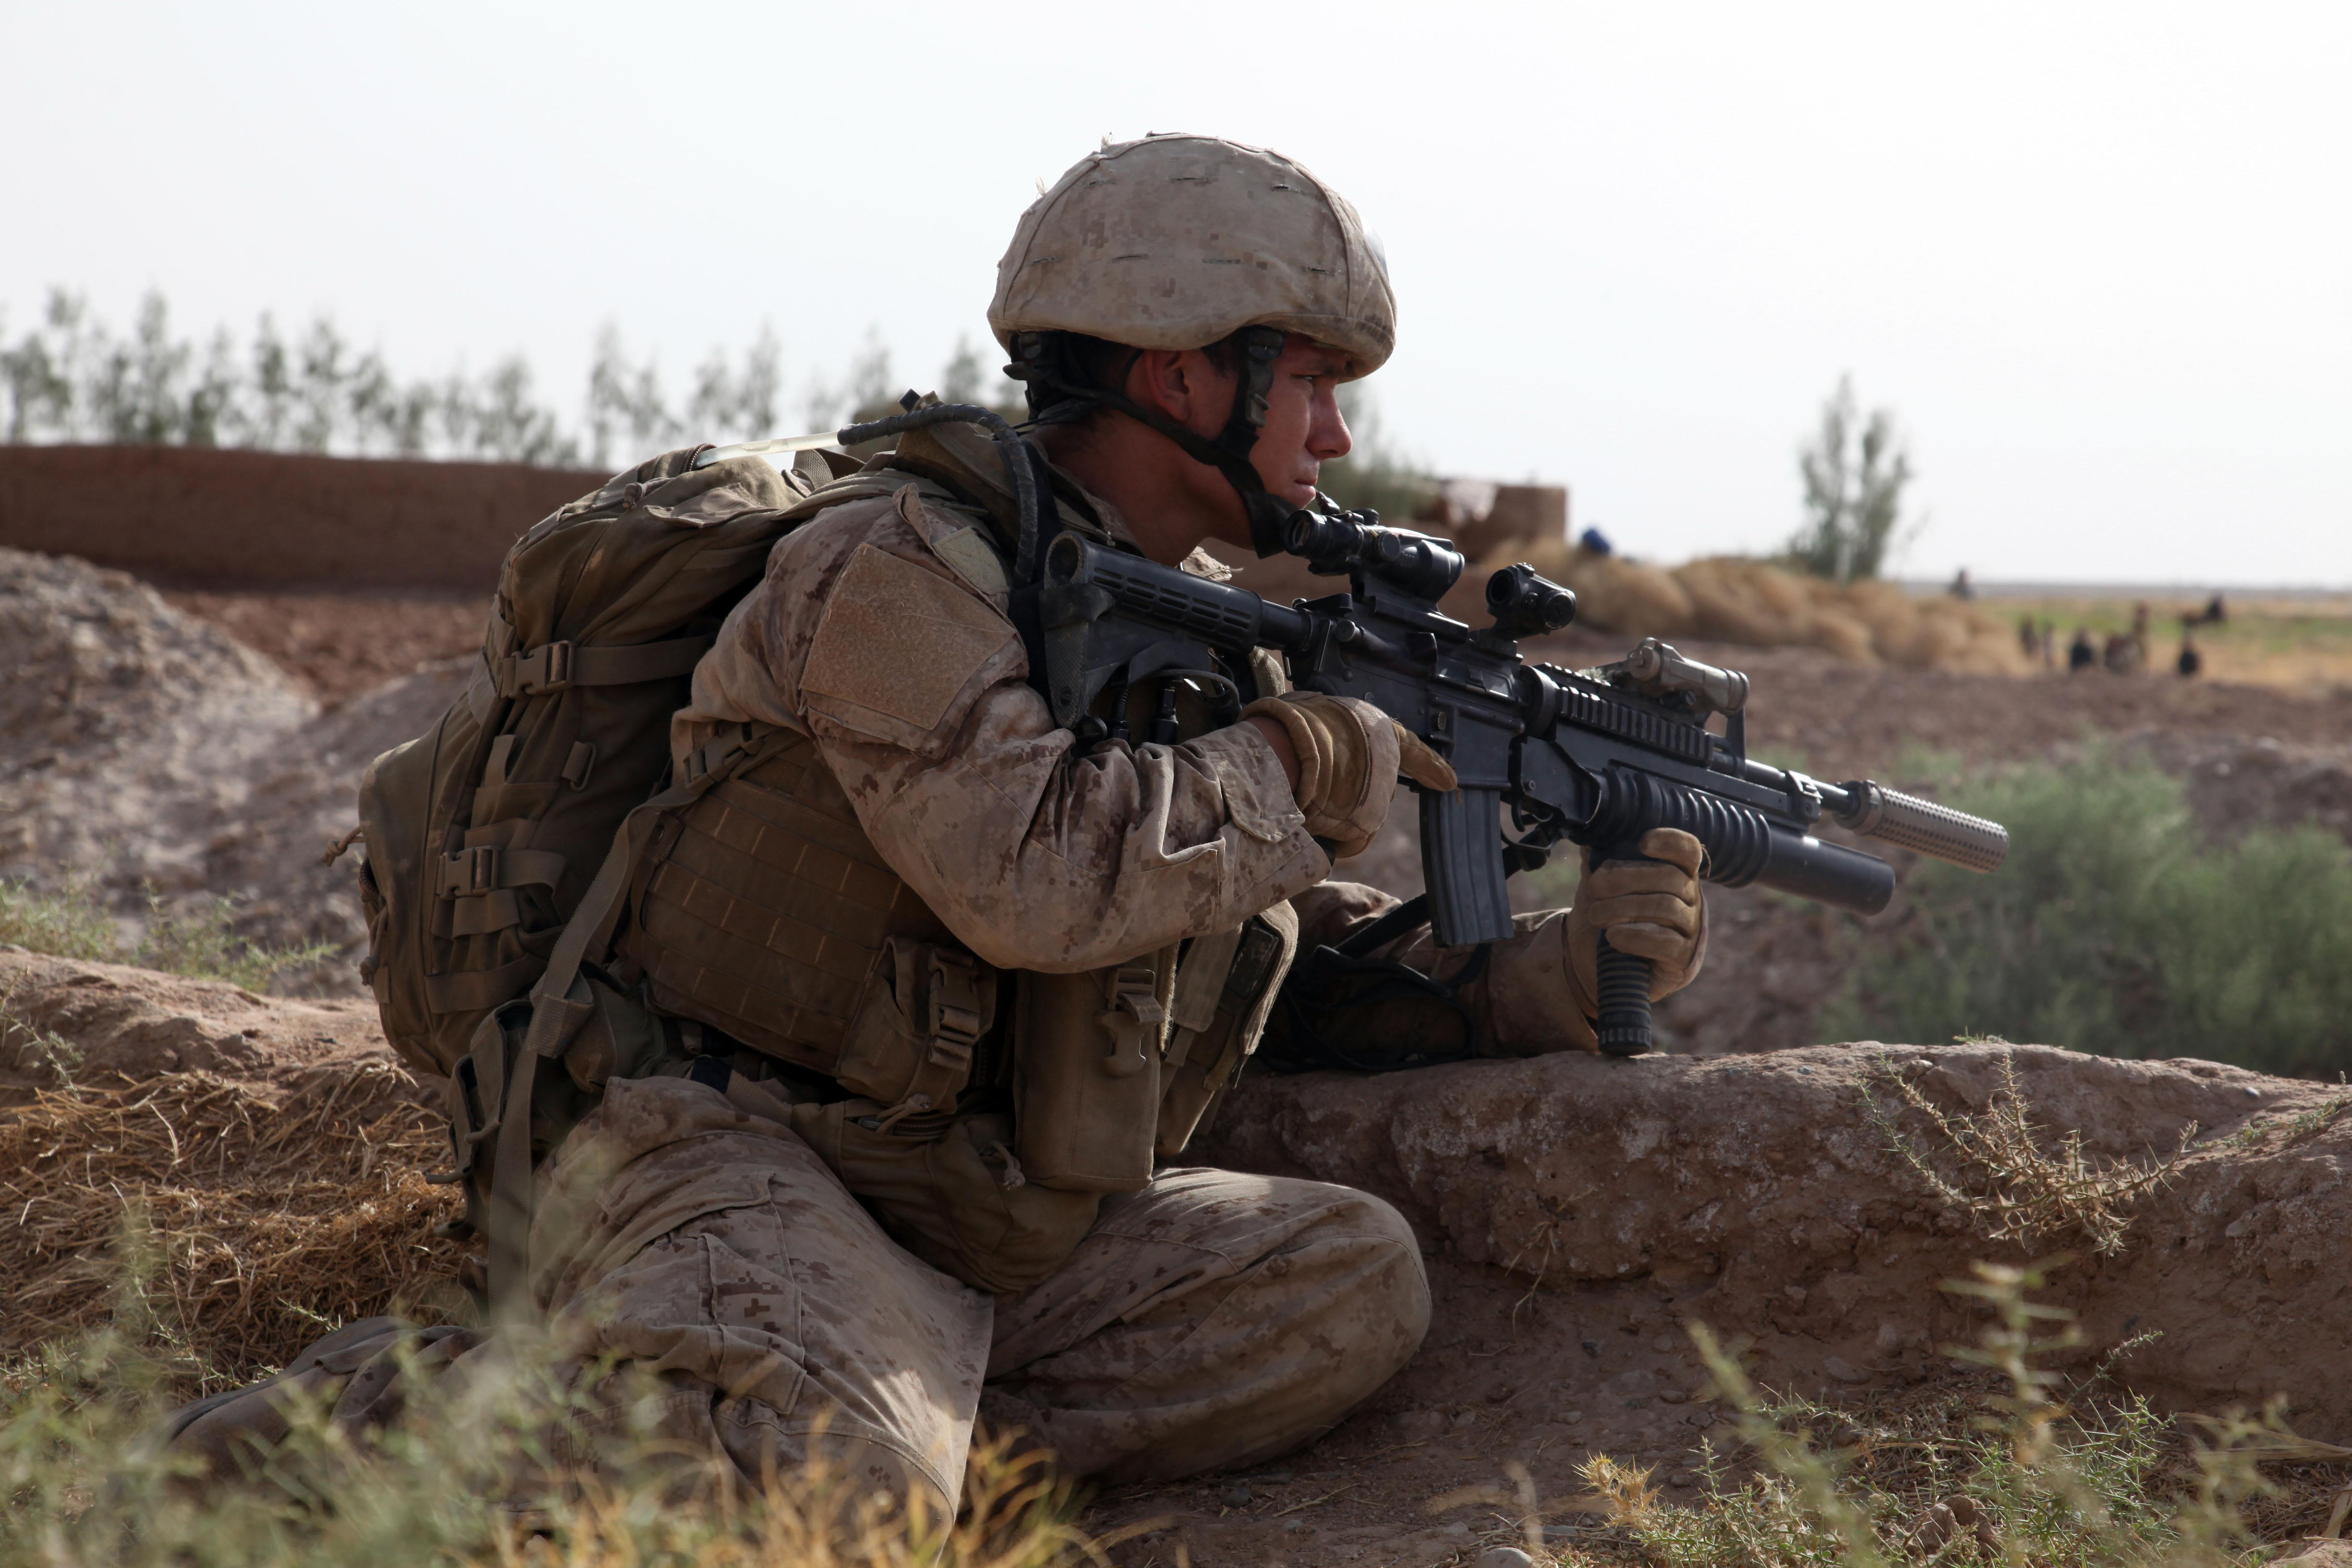 marine corps wallpaper border 5616x3744